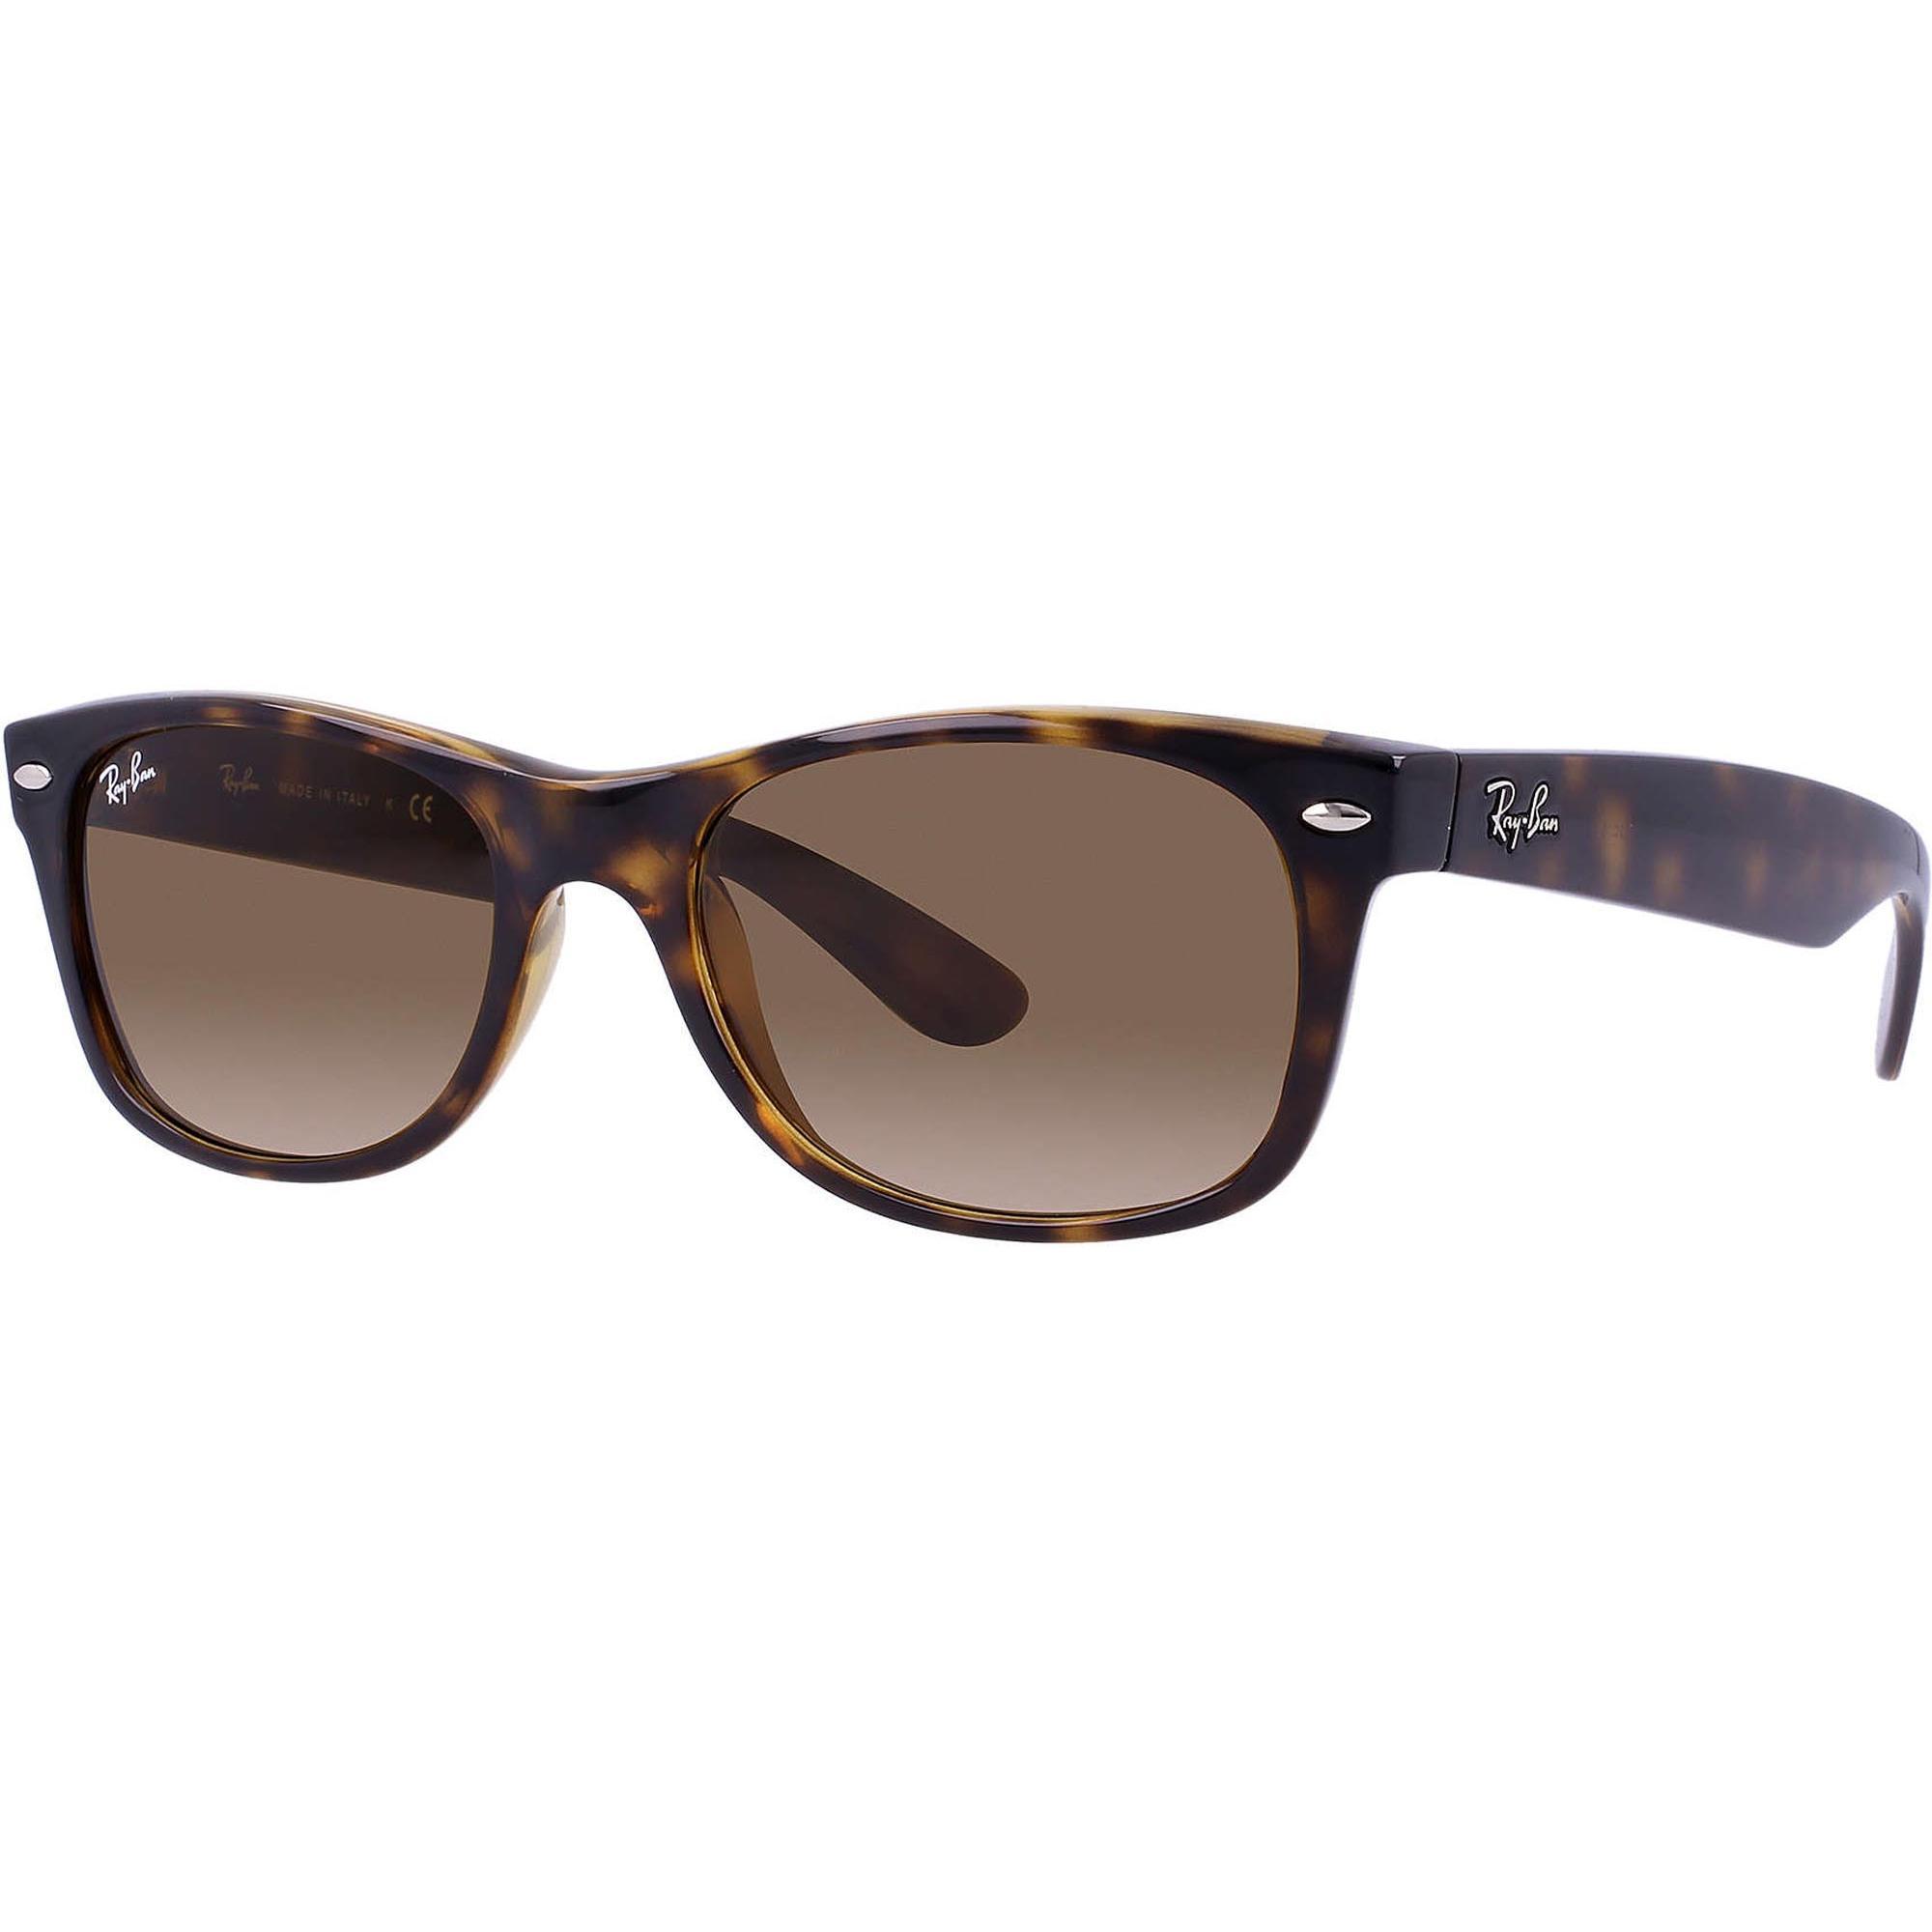 910304c19f ... where to buy ray ban. womens tortoise new wayfarer classic sunglasses  light brown gradient lenses